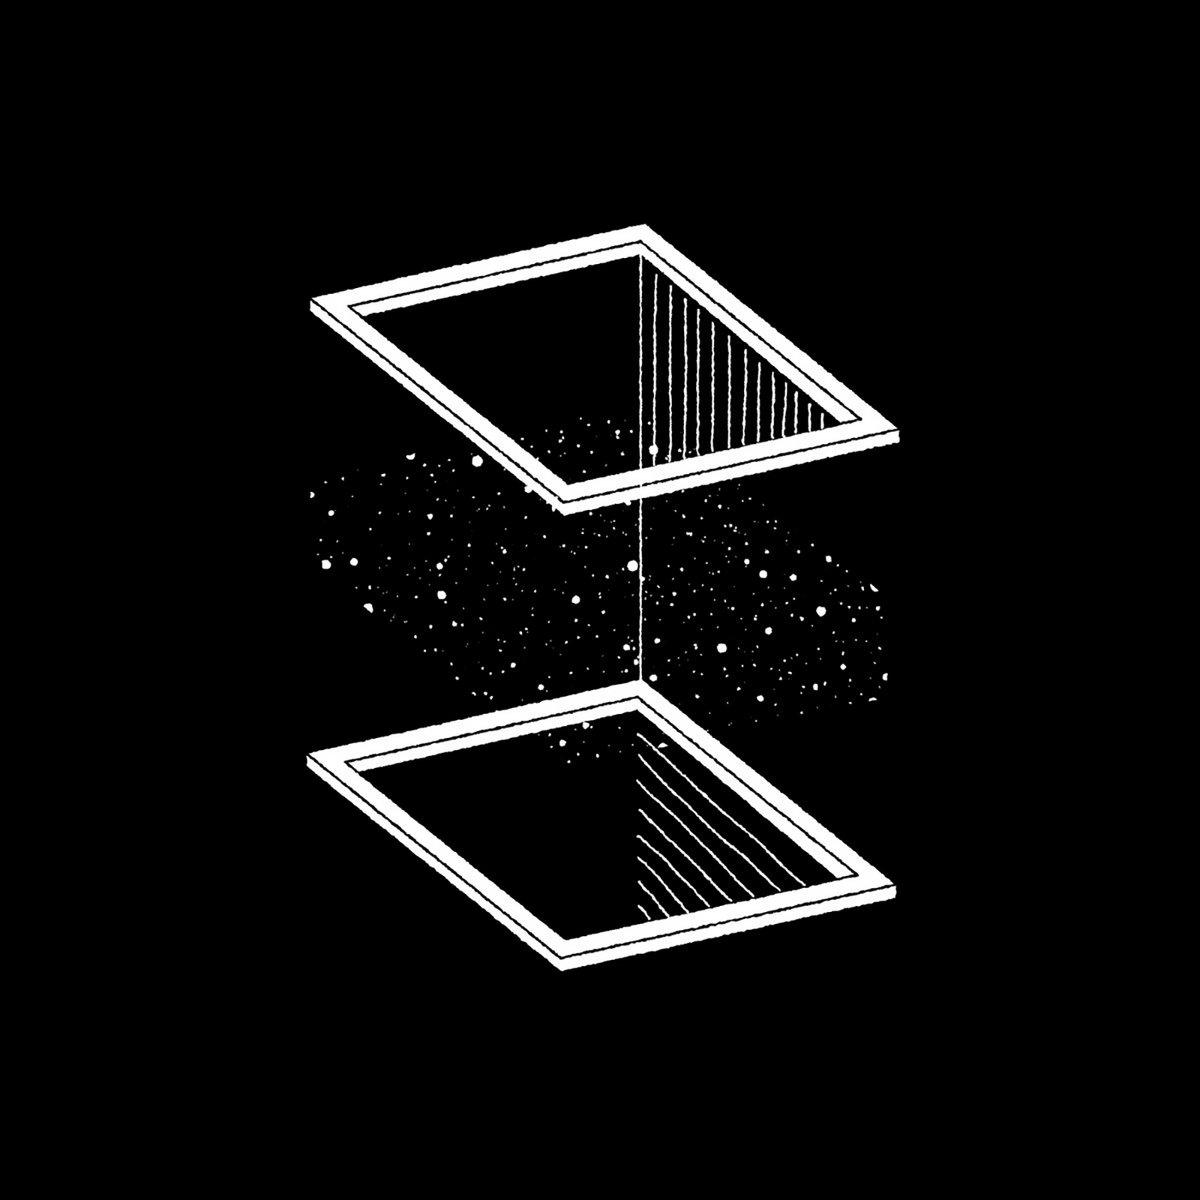 MOTIONAL + GRAND CIEL - Ater - Iterare [Split]